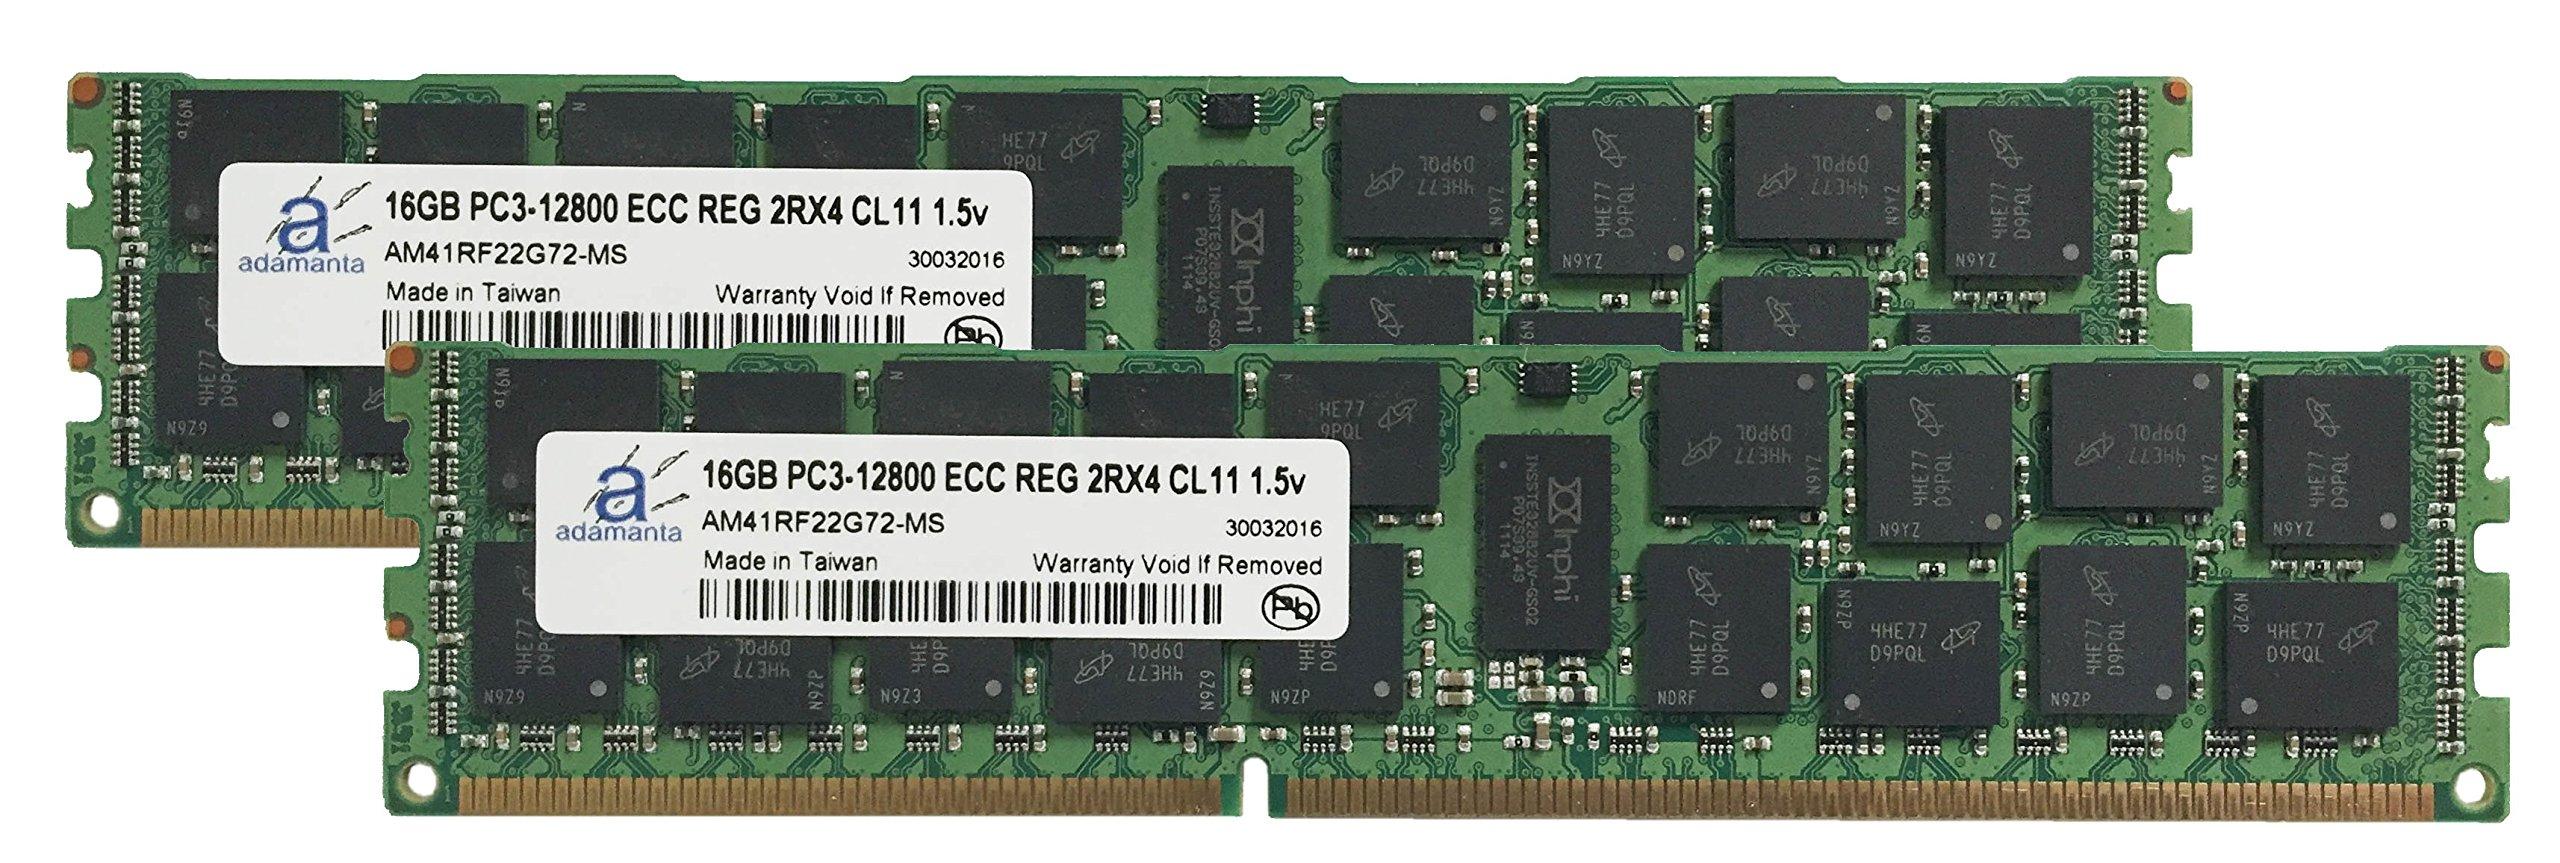 Adamanta 32GB (2x16GB) Server Memory Upgrade for Dell PowerEdge T320 DDR3 1600Mhz PC3-12800 ECC Registered 2Rx4 CL11 1.5v